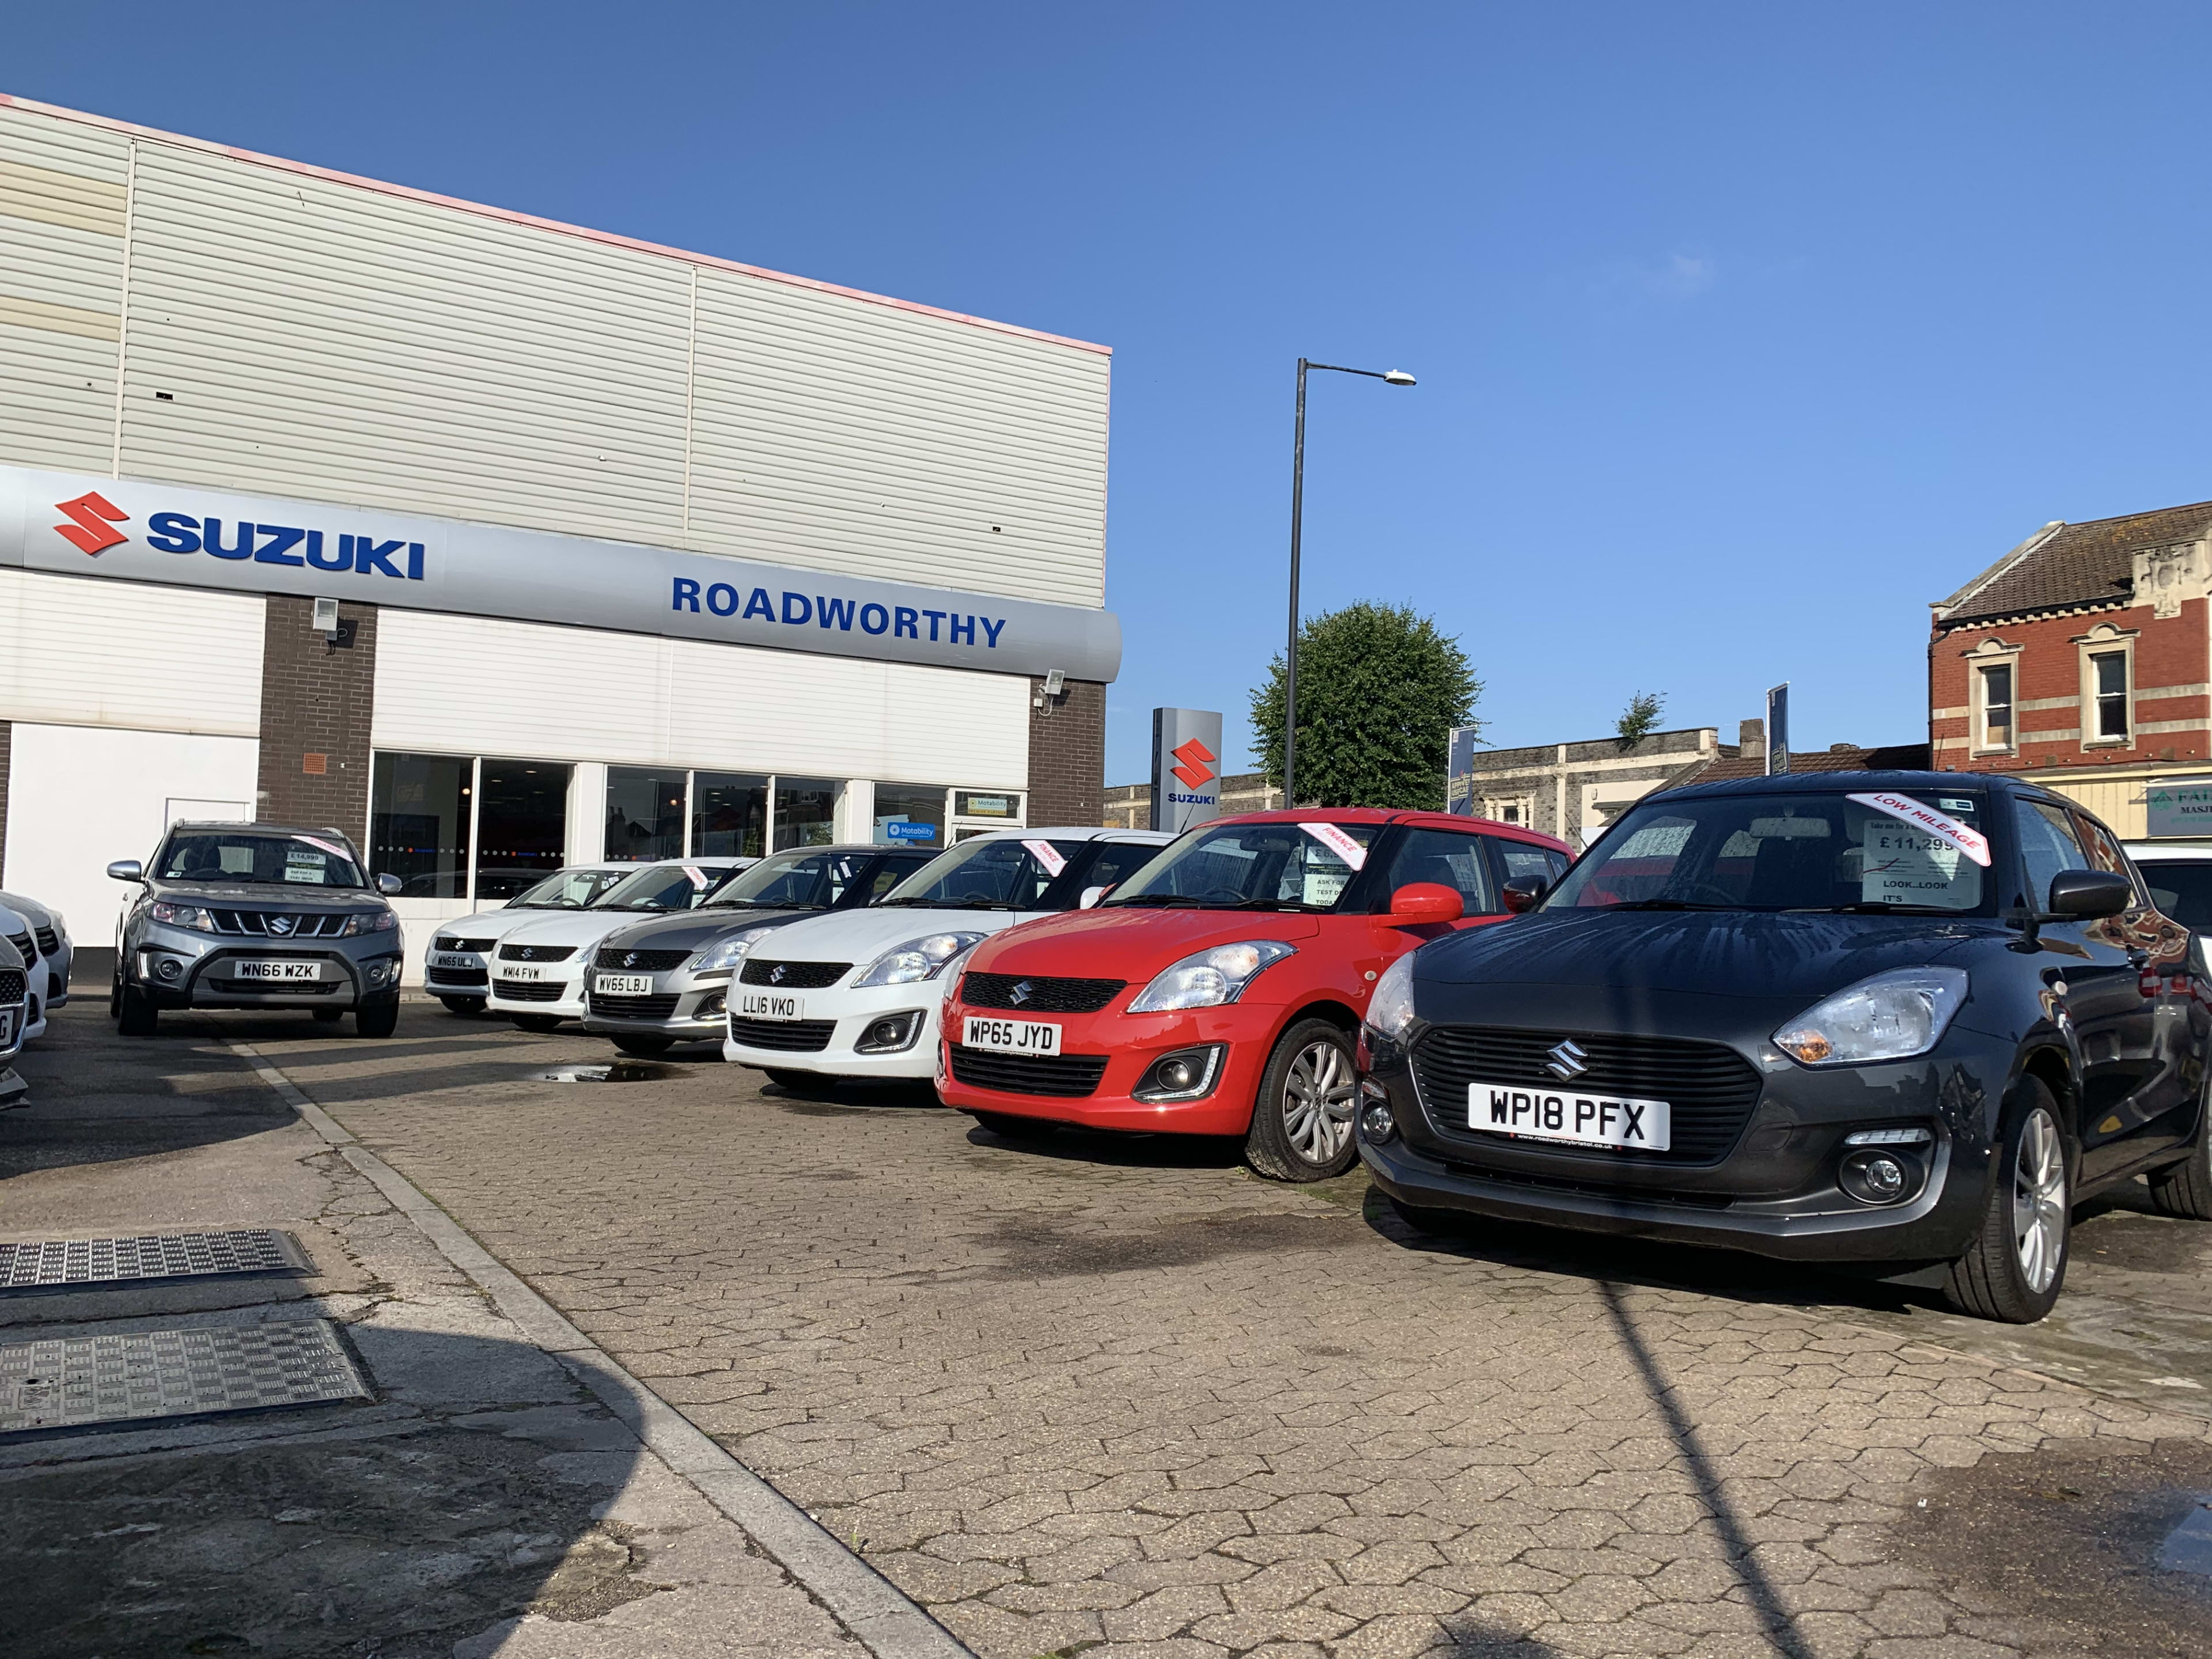 Suzuki Car Dealership >> New Suzuki Cars Bristol Roadworthy Bristol